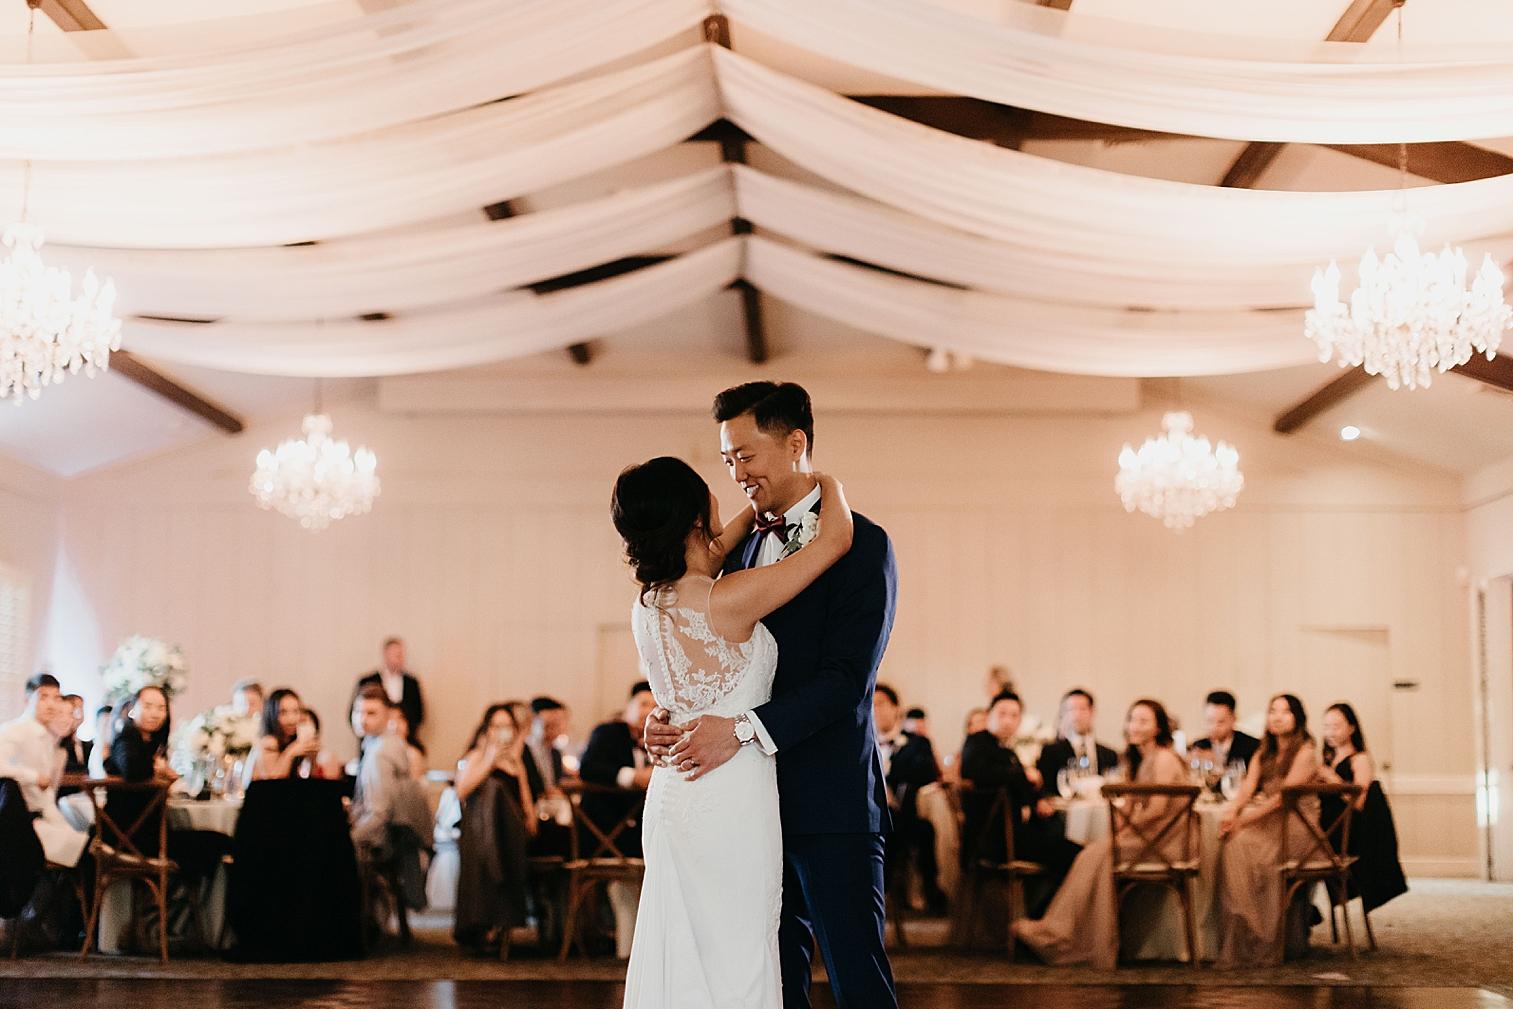 Secret-Garden-Rancho-Santa-Fe-Wedding-112.jpg